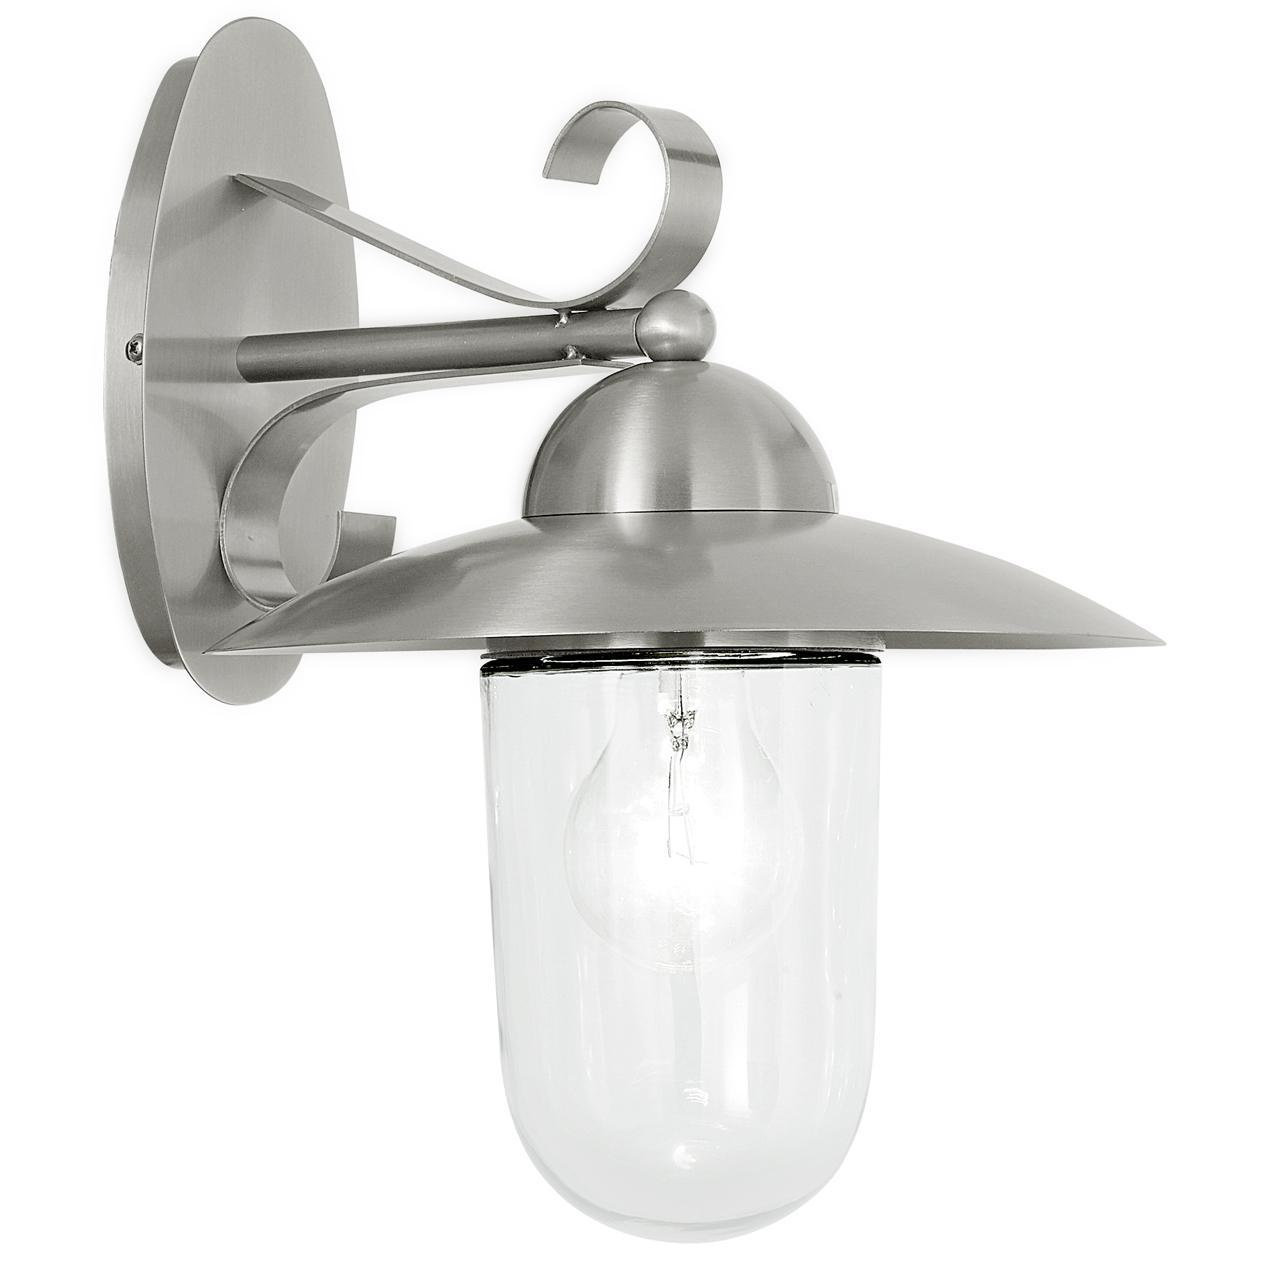 Уличный настенный светильник Eglo Milton 83588 цены онлайн